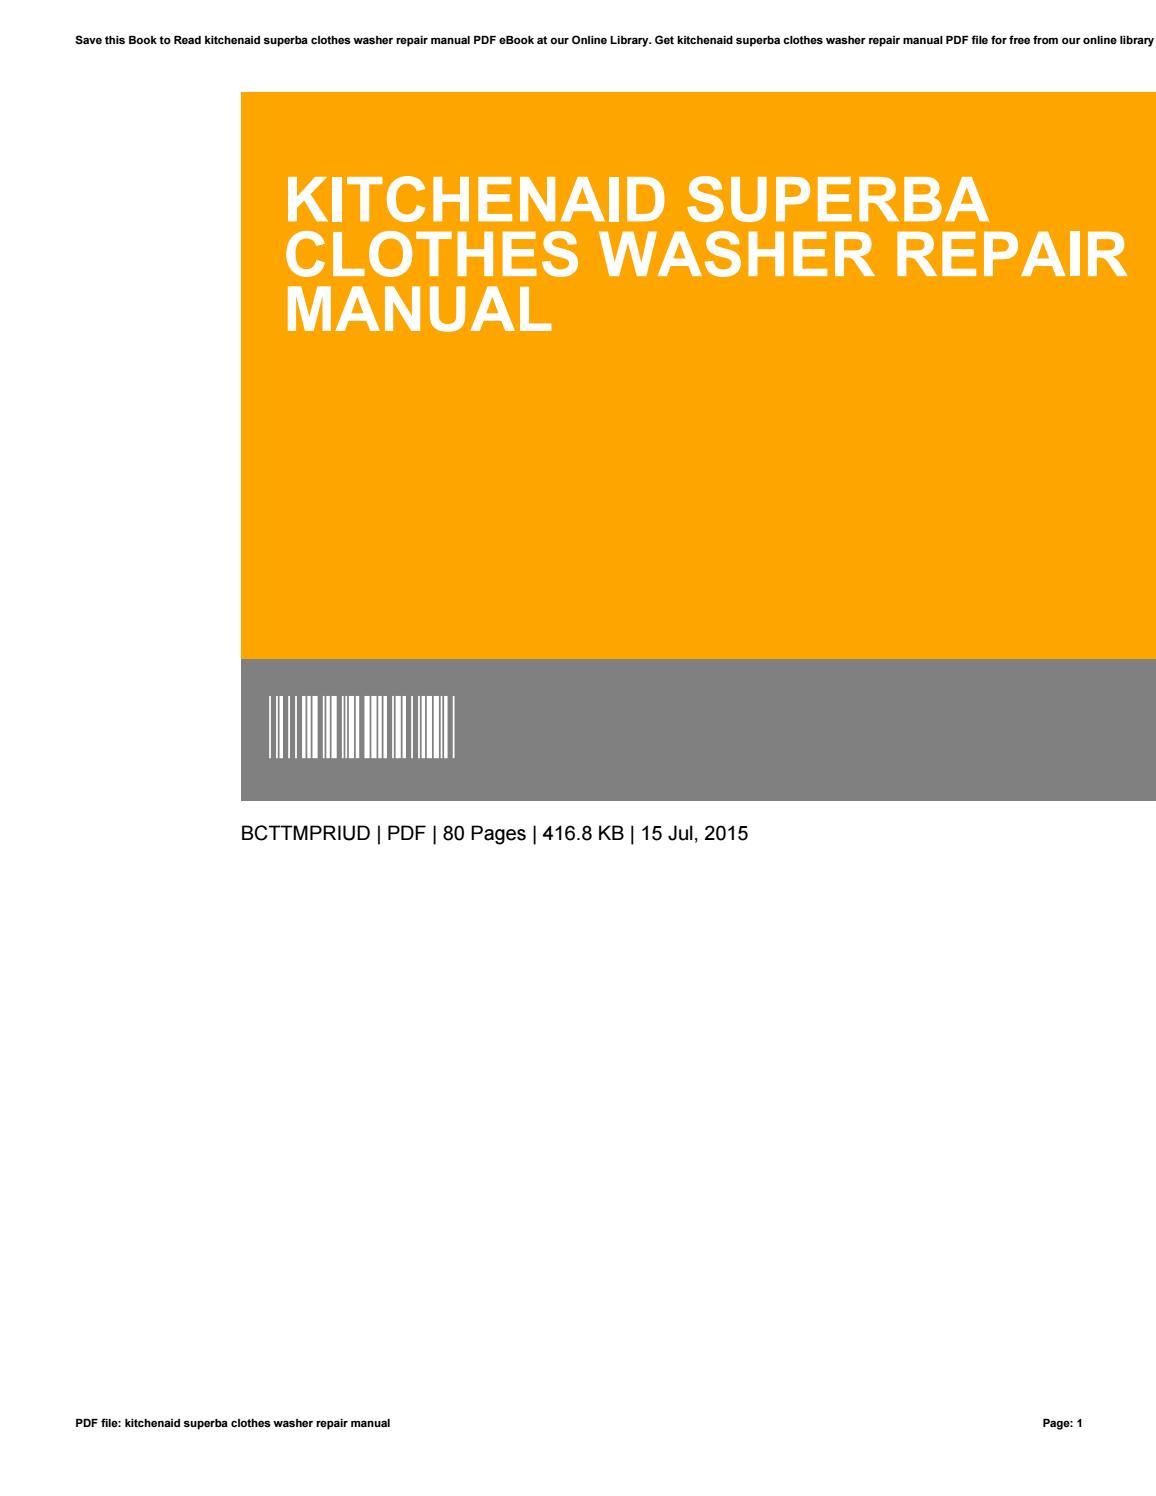 Kitchenaid Superba Clothes Washer Repair Manual By